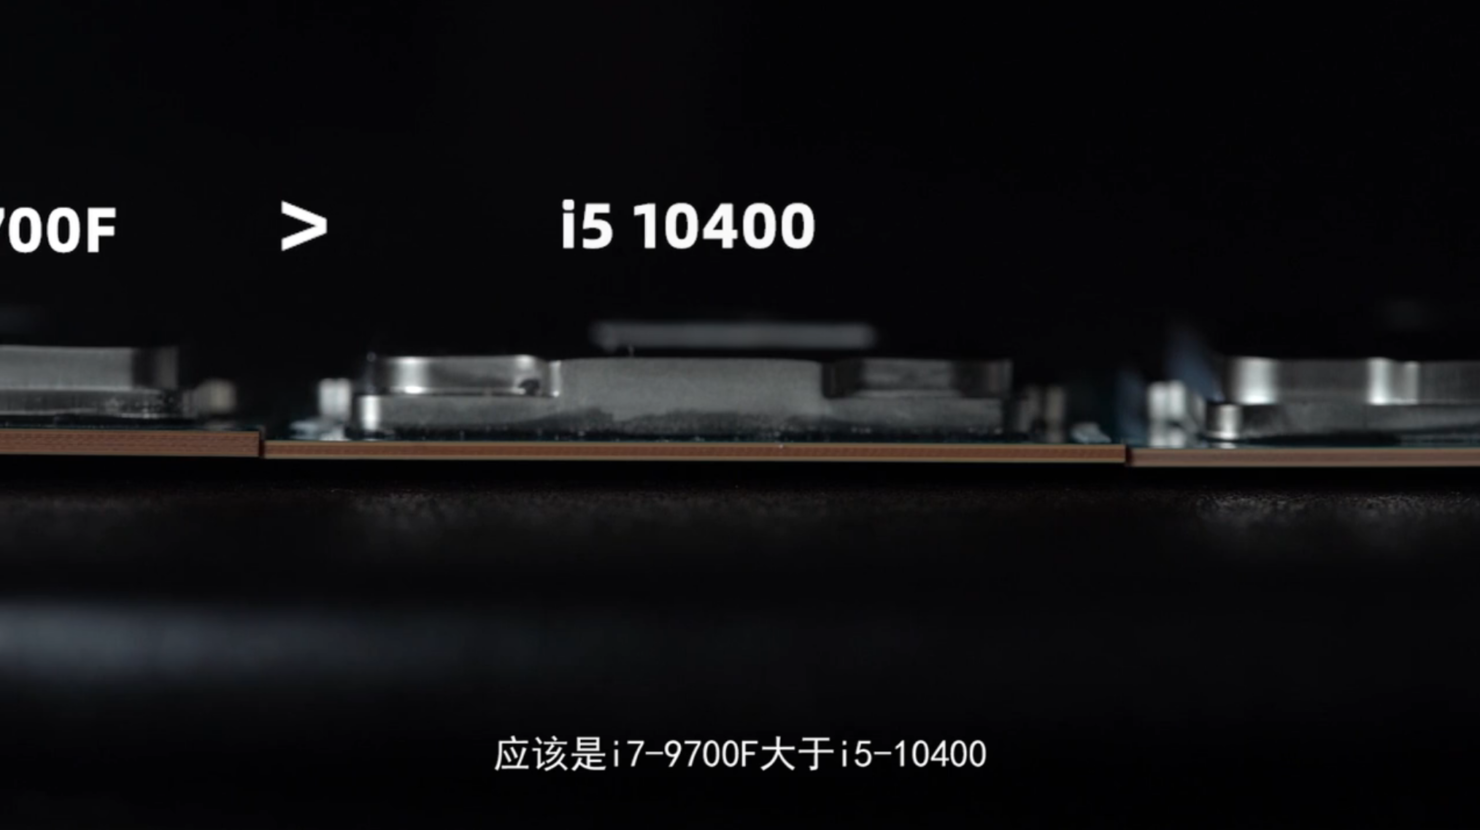 intel-core-i5-10400-comet-lake-s-6-core-desktop-cpu_pcb_1